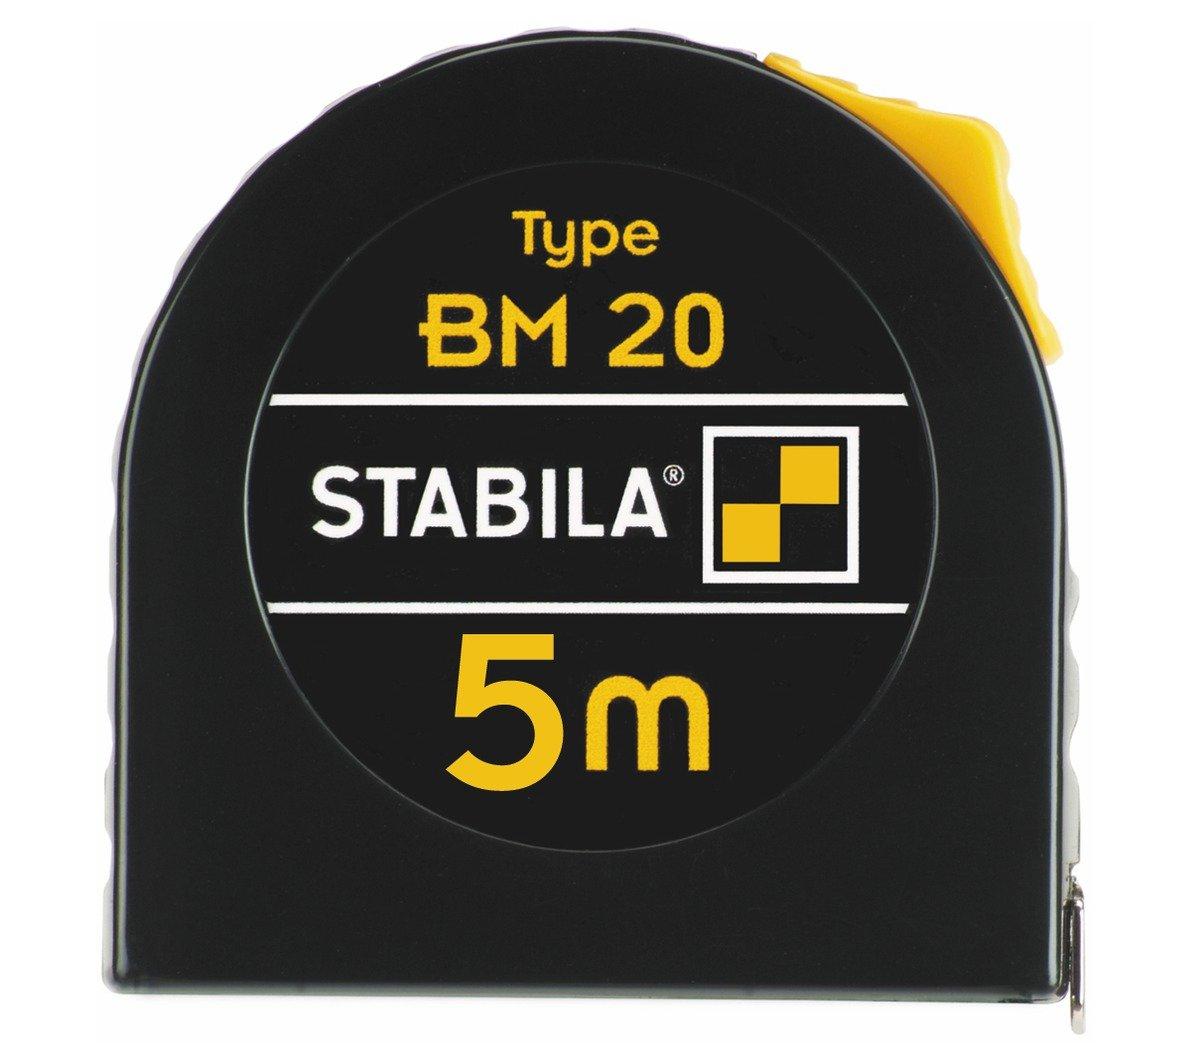 Stabila MPBM20 BM 20 Mè tre-ruban de poche, Noir/jaune, 5 m 16446